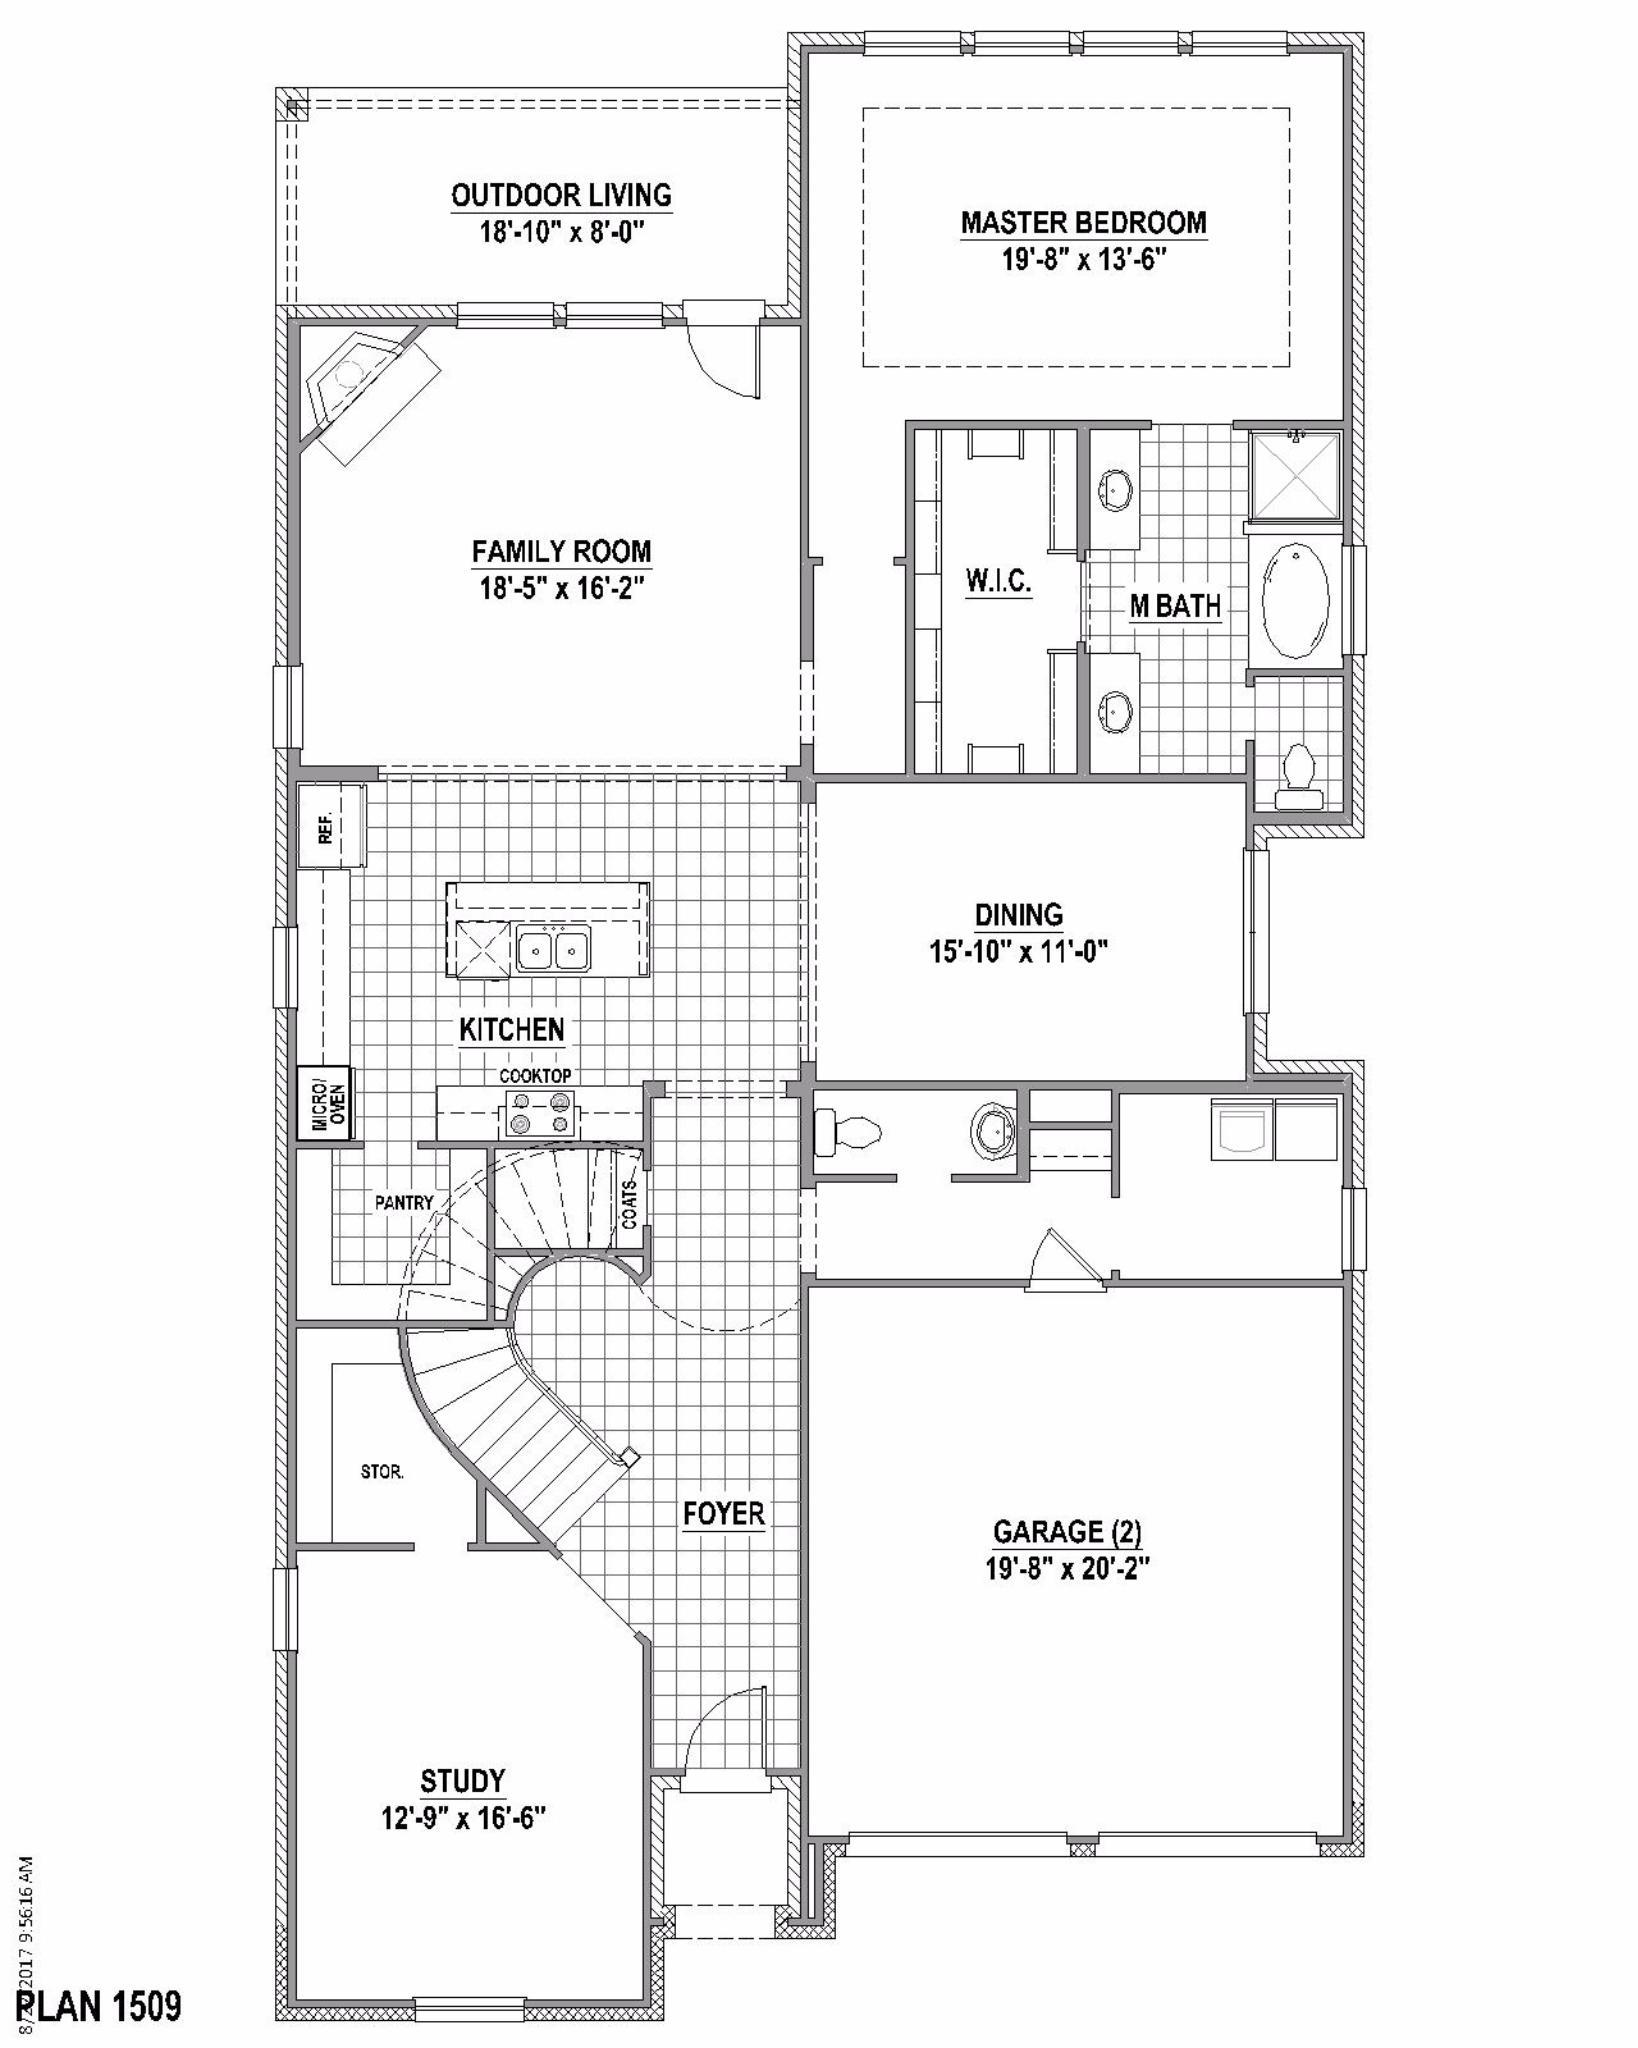 Plan 1509 Floor Plan American Legend Homes